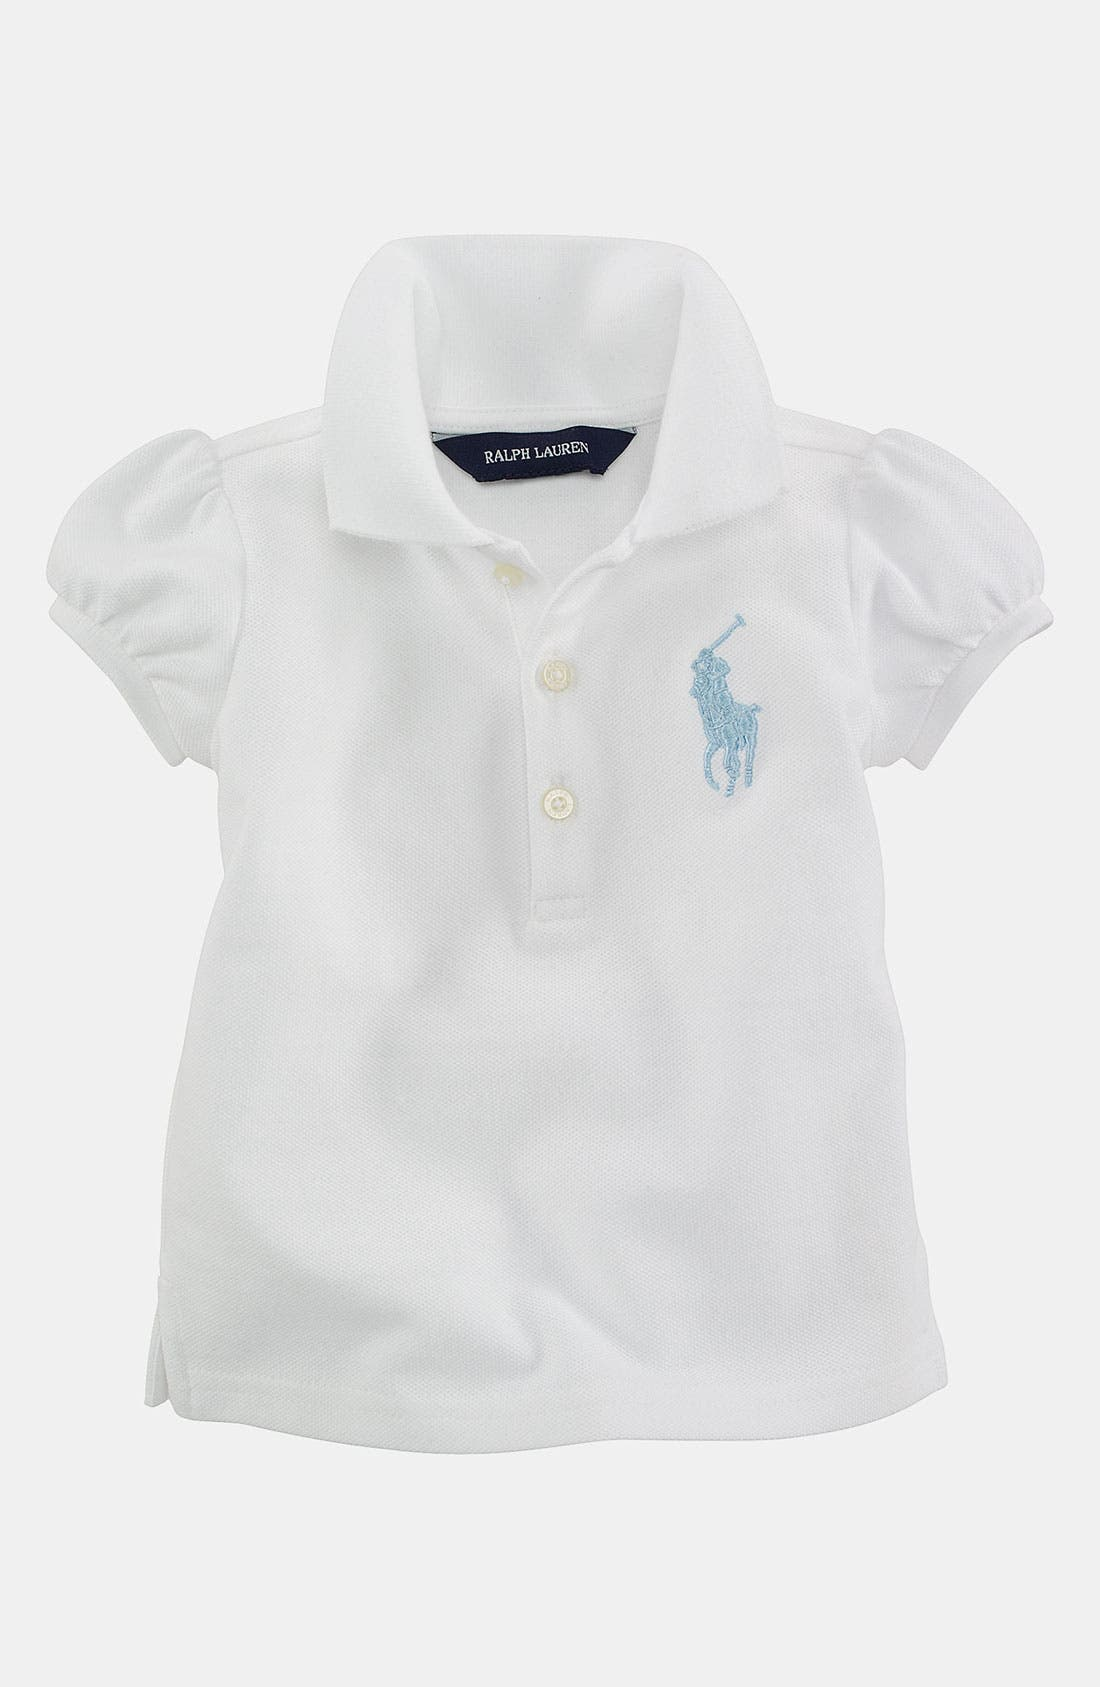 Main Image - Ralph Lauren Polo Shirt (Infant)